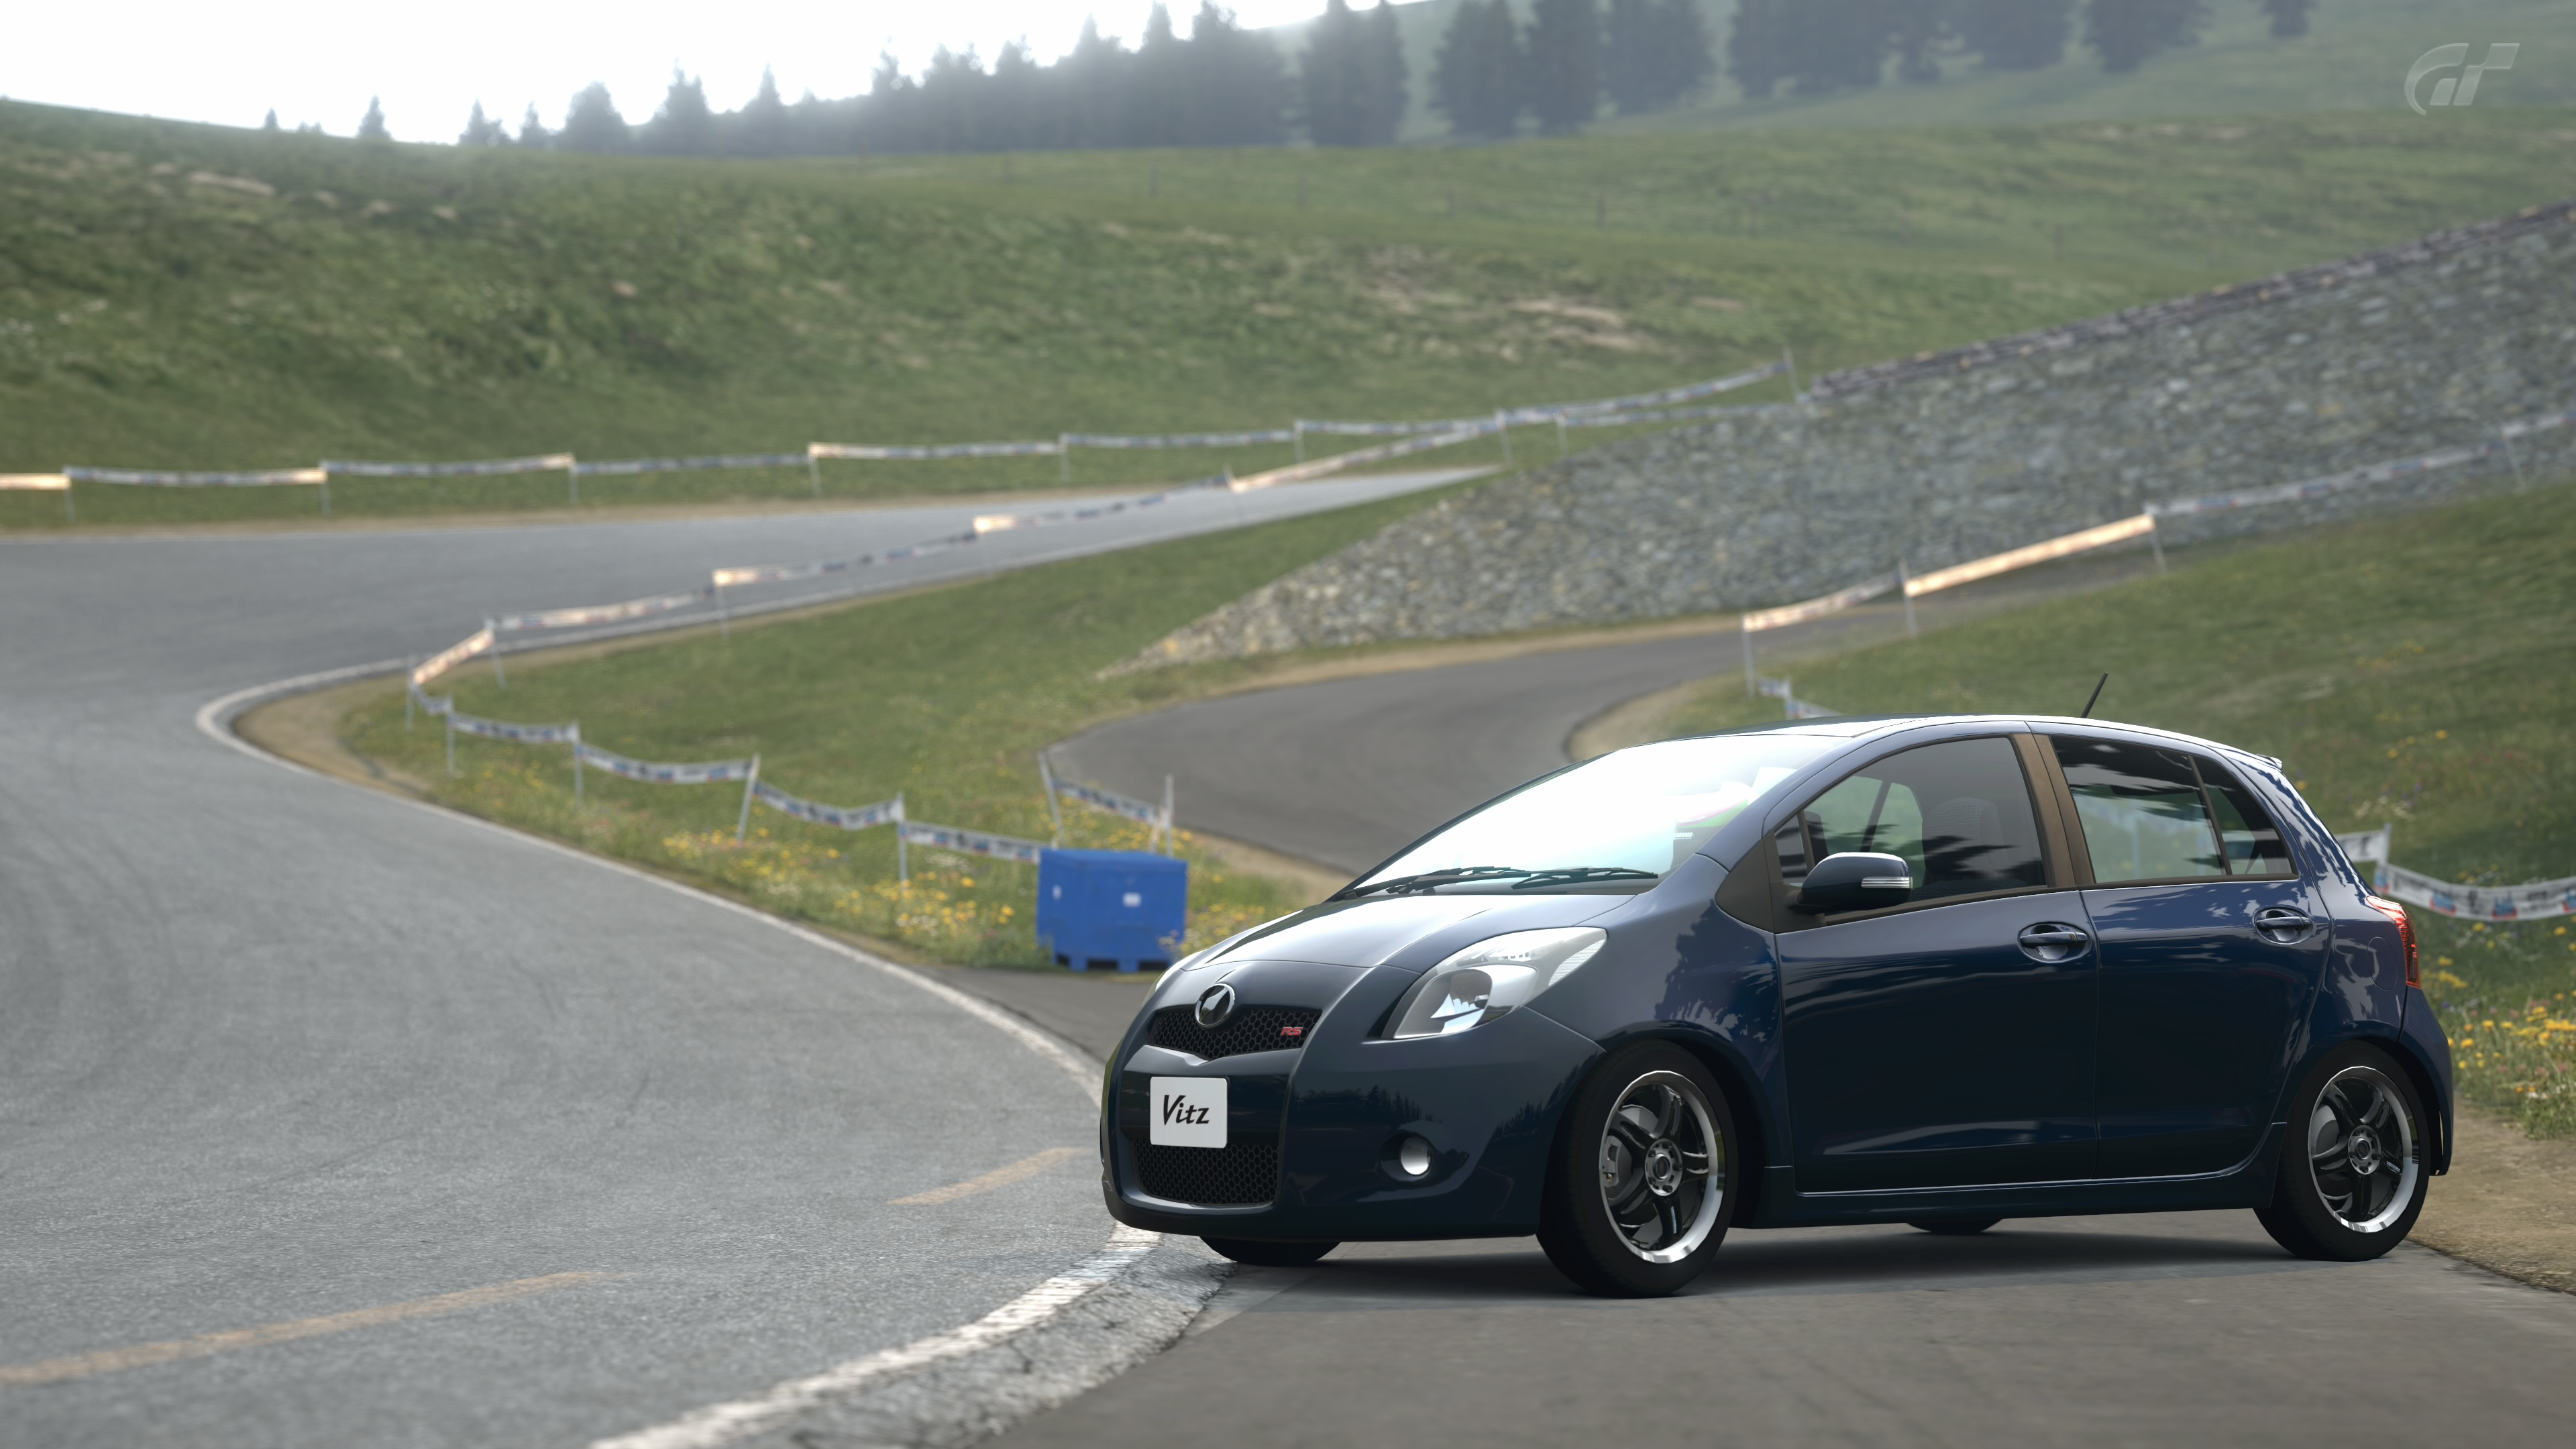 Toyota vitz rs 1.5 '07 photo